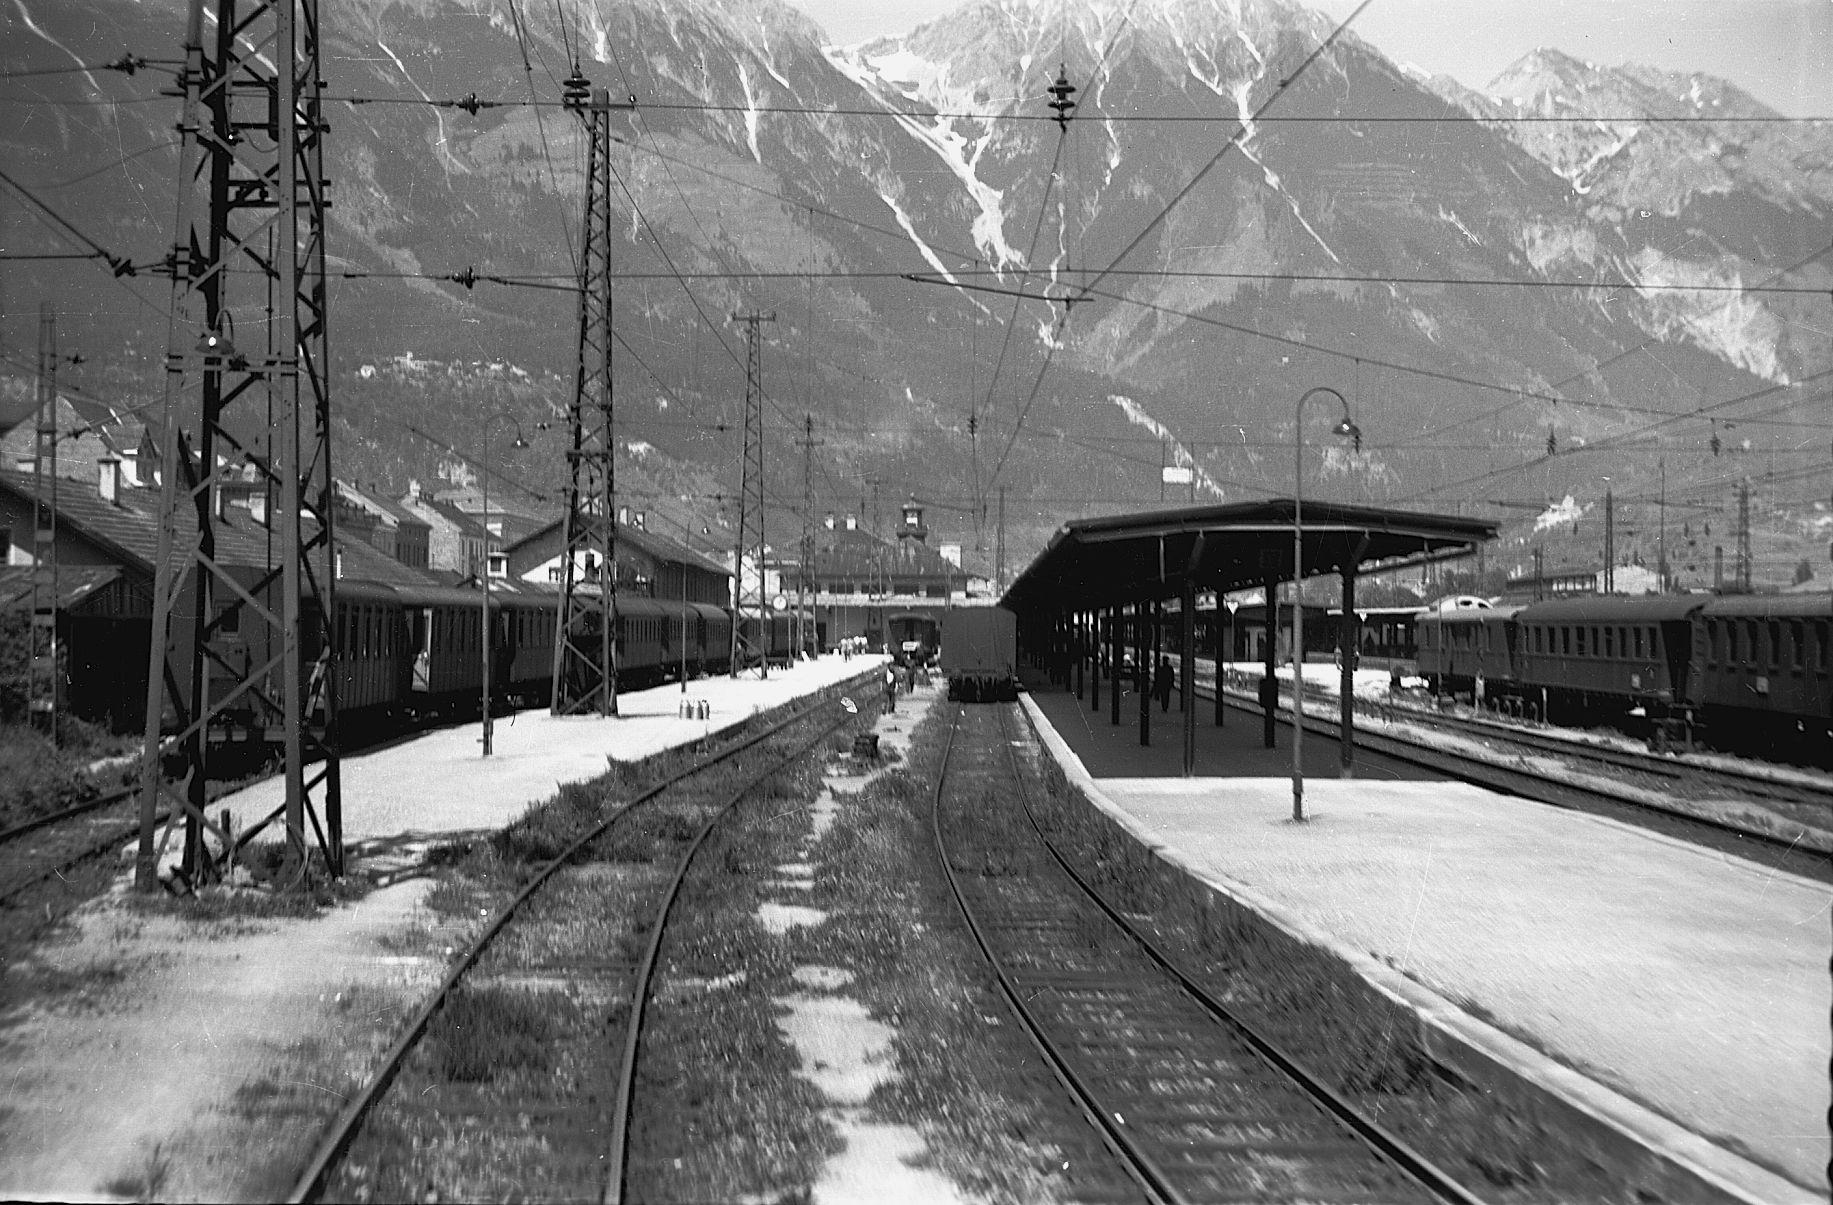 Endstation Innsbruck I